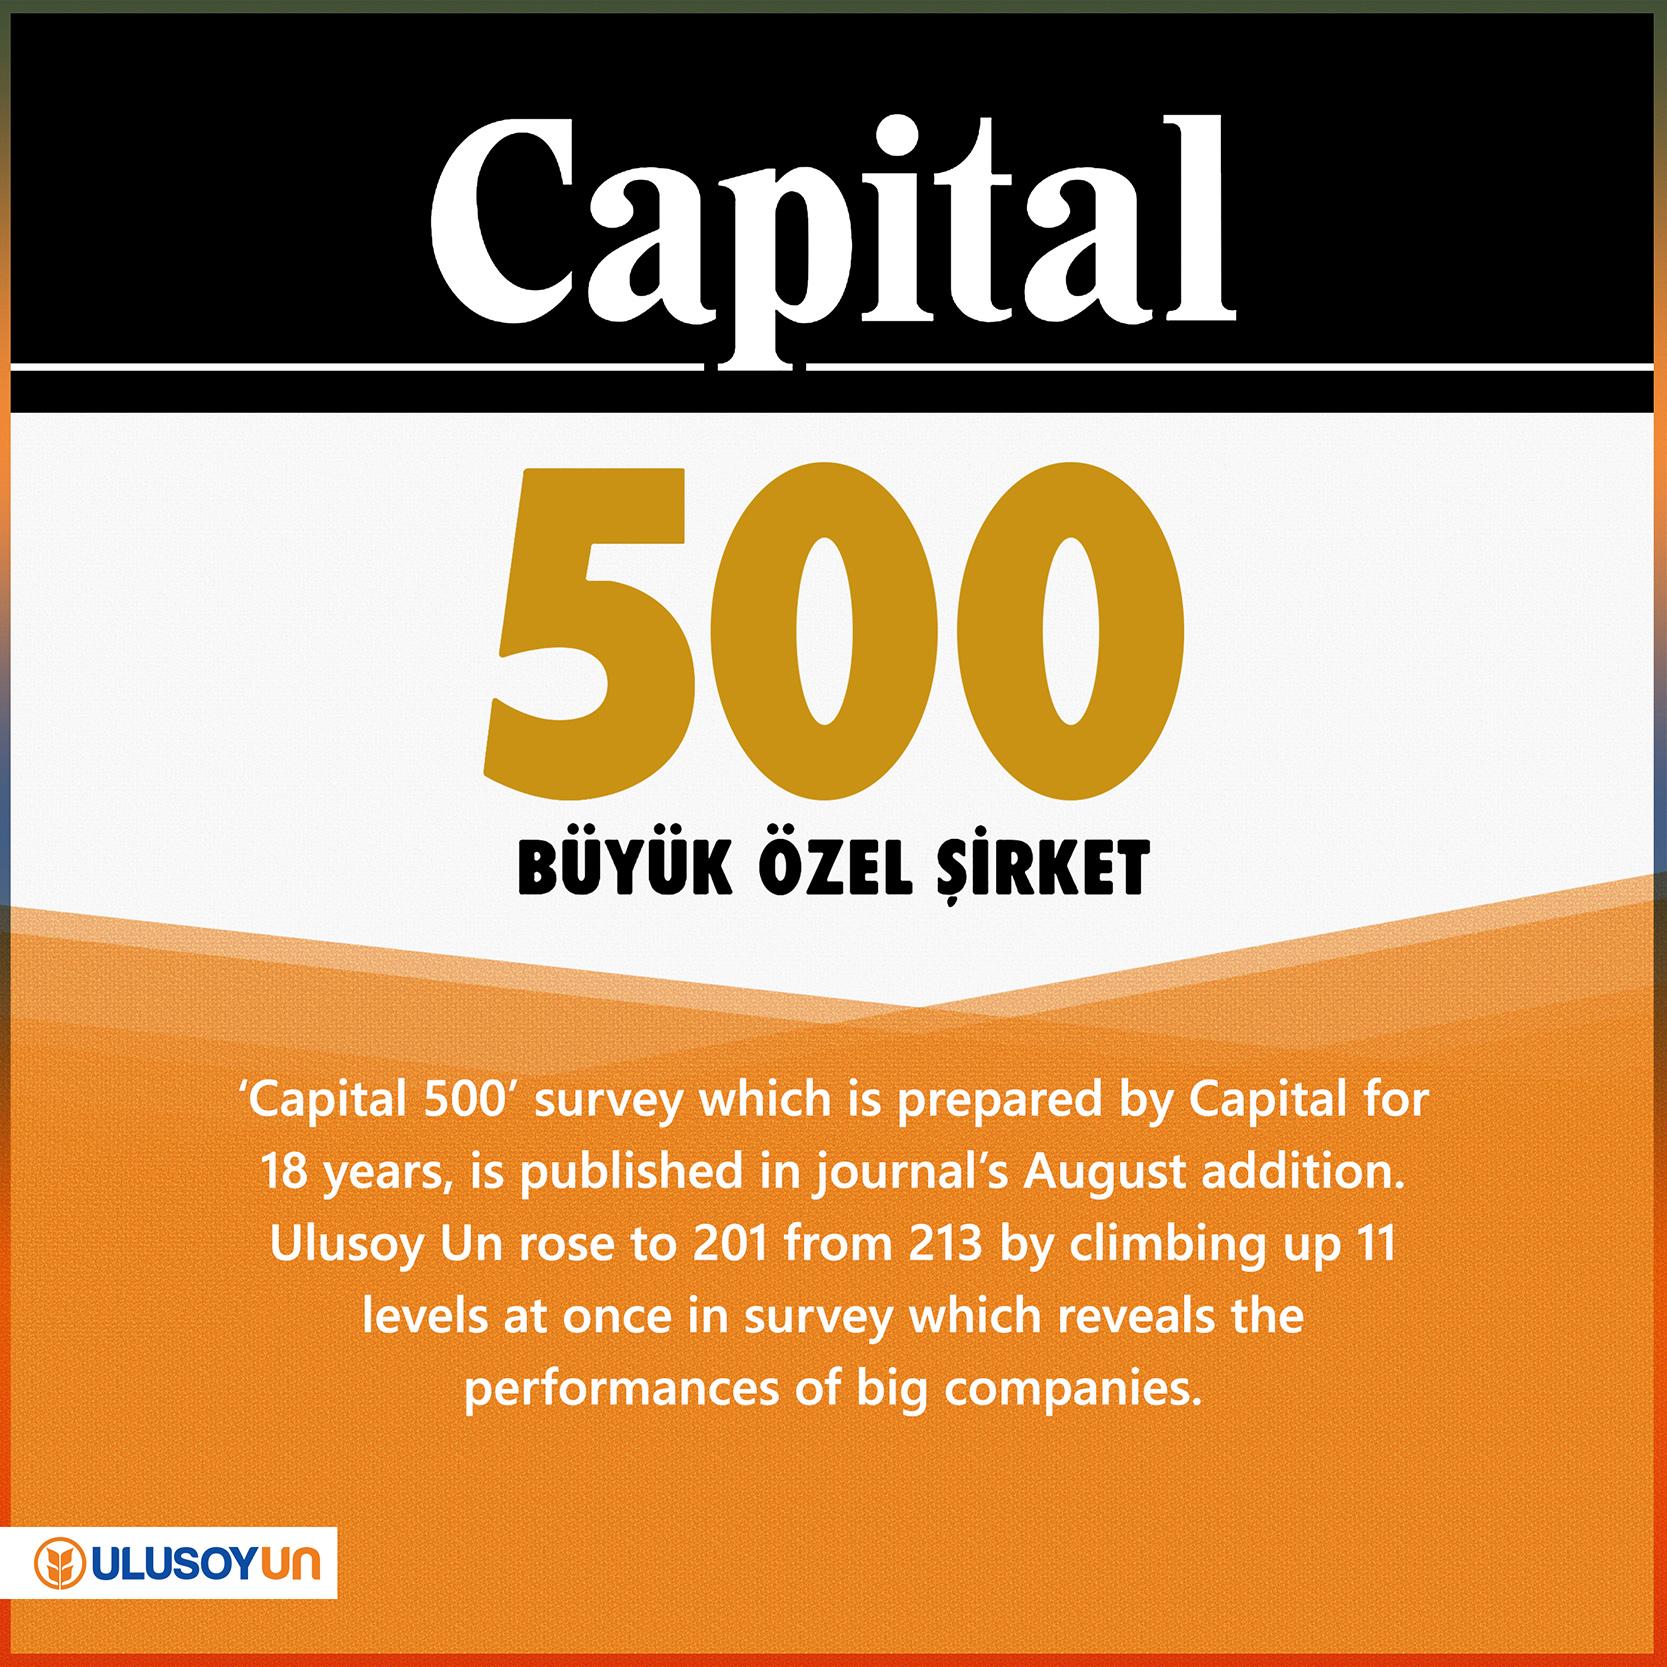 Capital500, 2016, survey, Ulusoy Un, economy